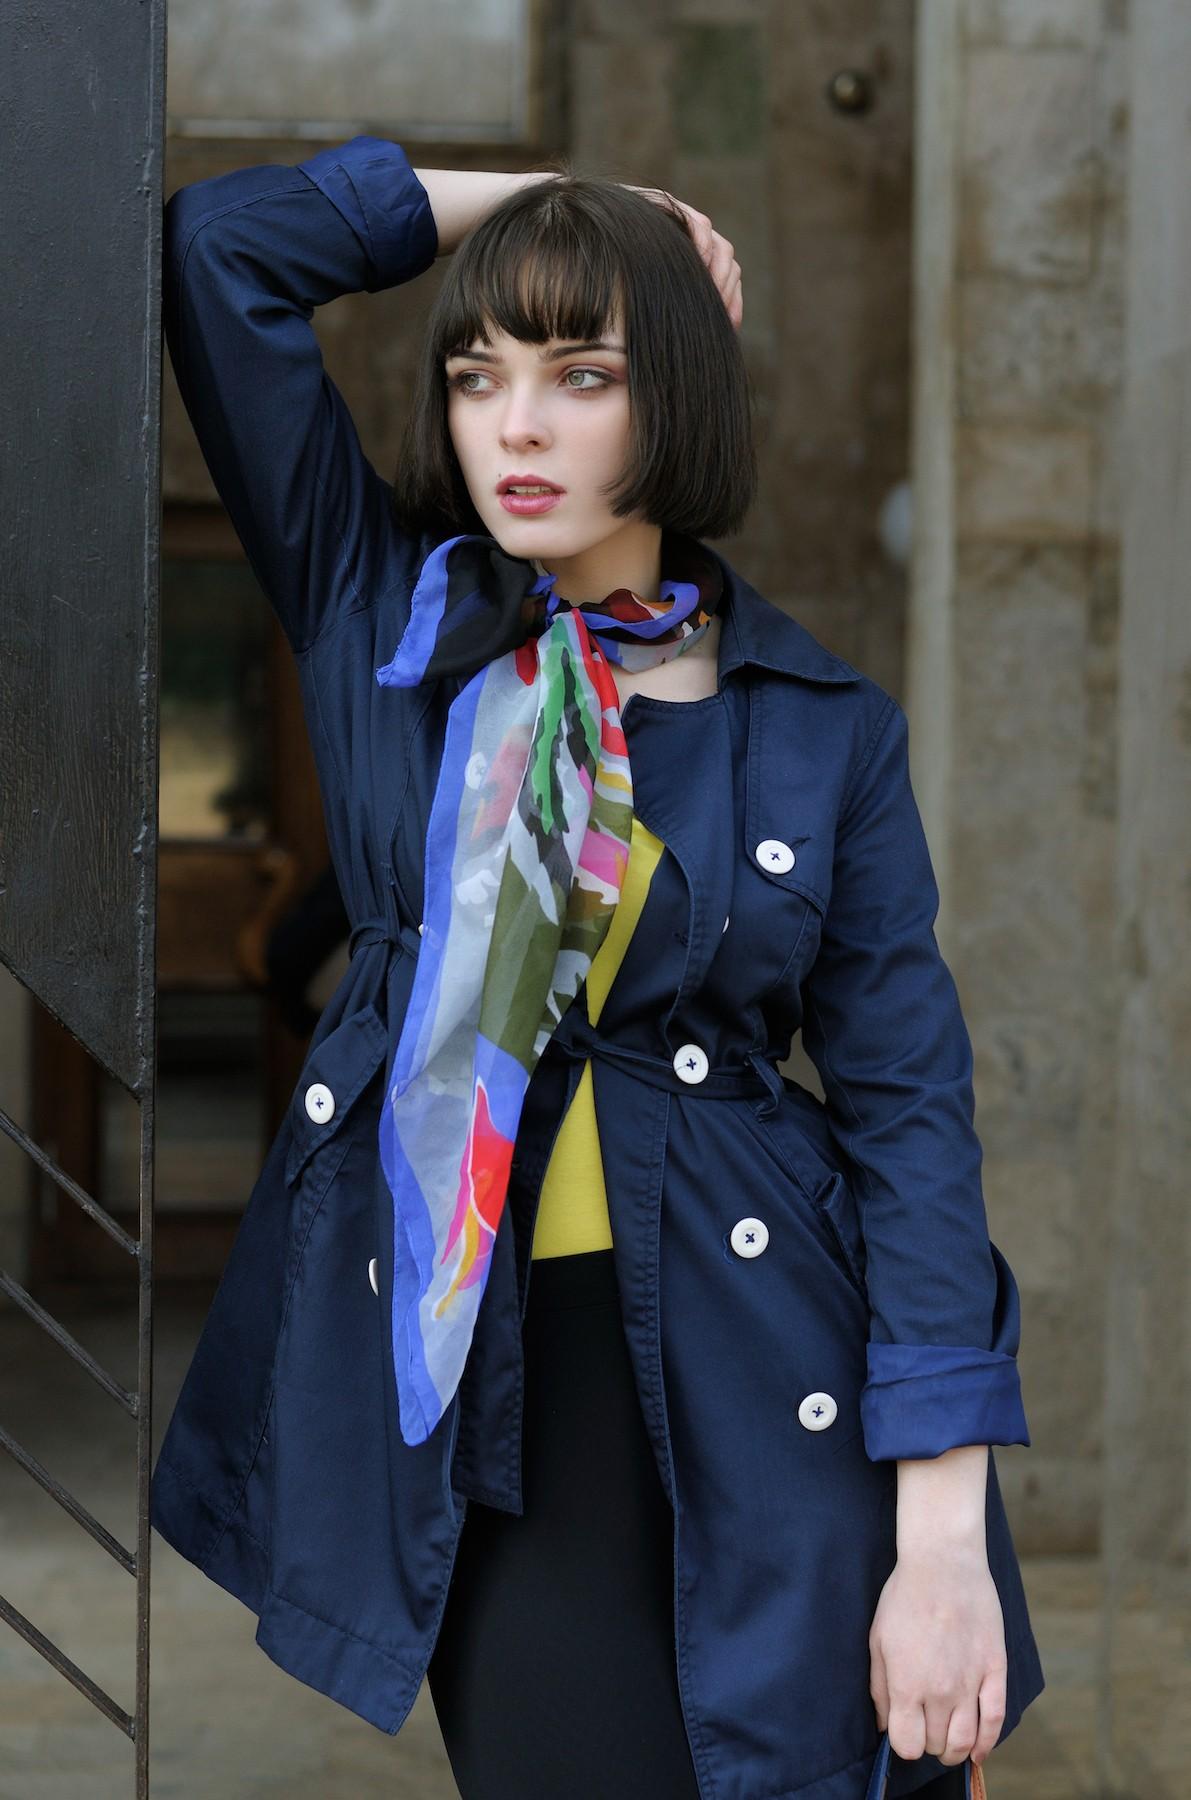 Wanita kaukasia dengan model rambut bob untuk rambut tipis French bob